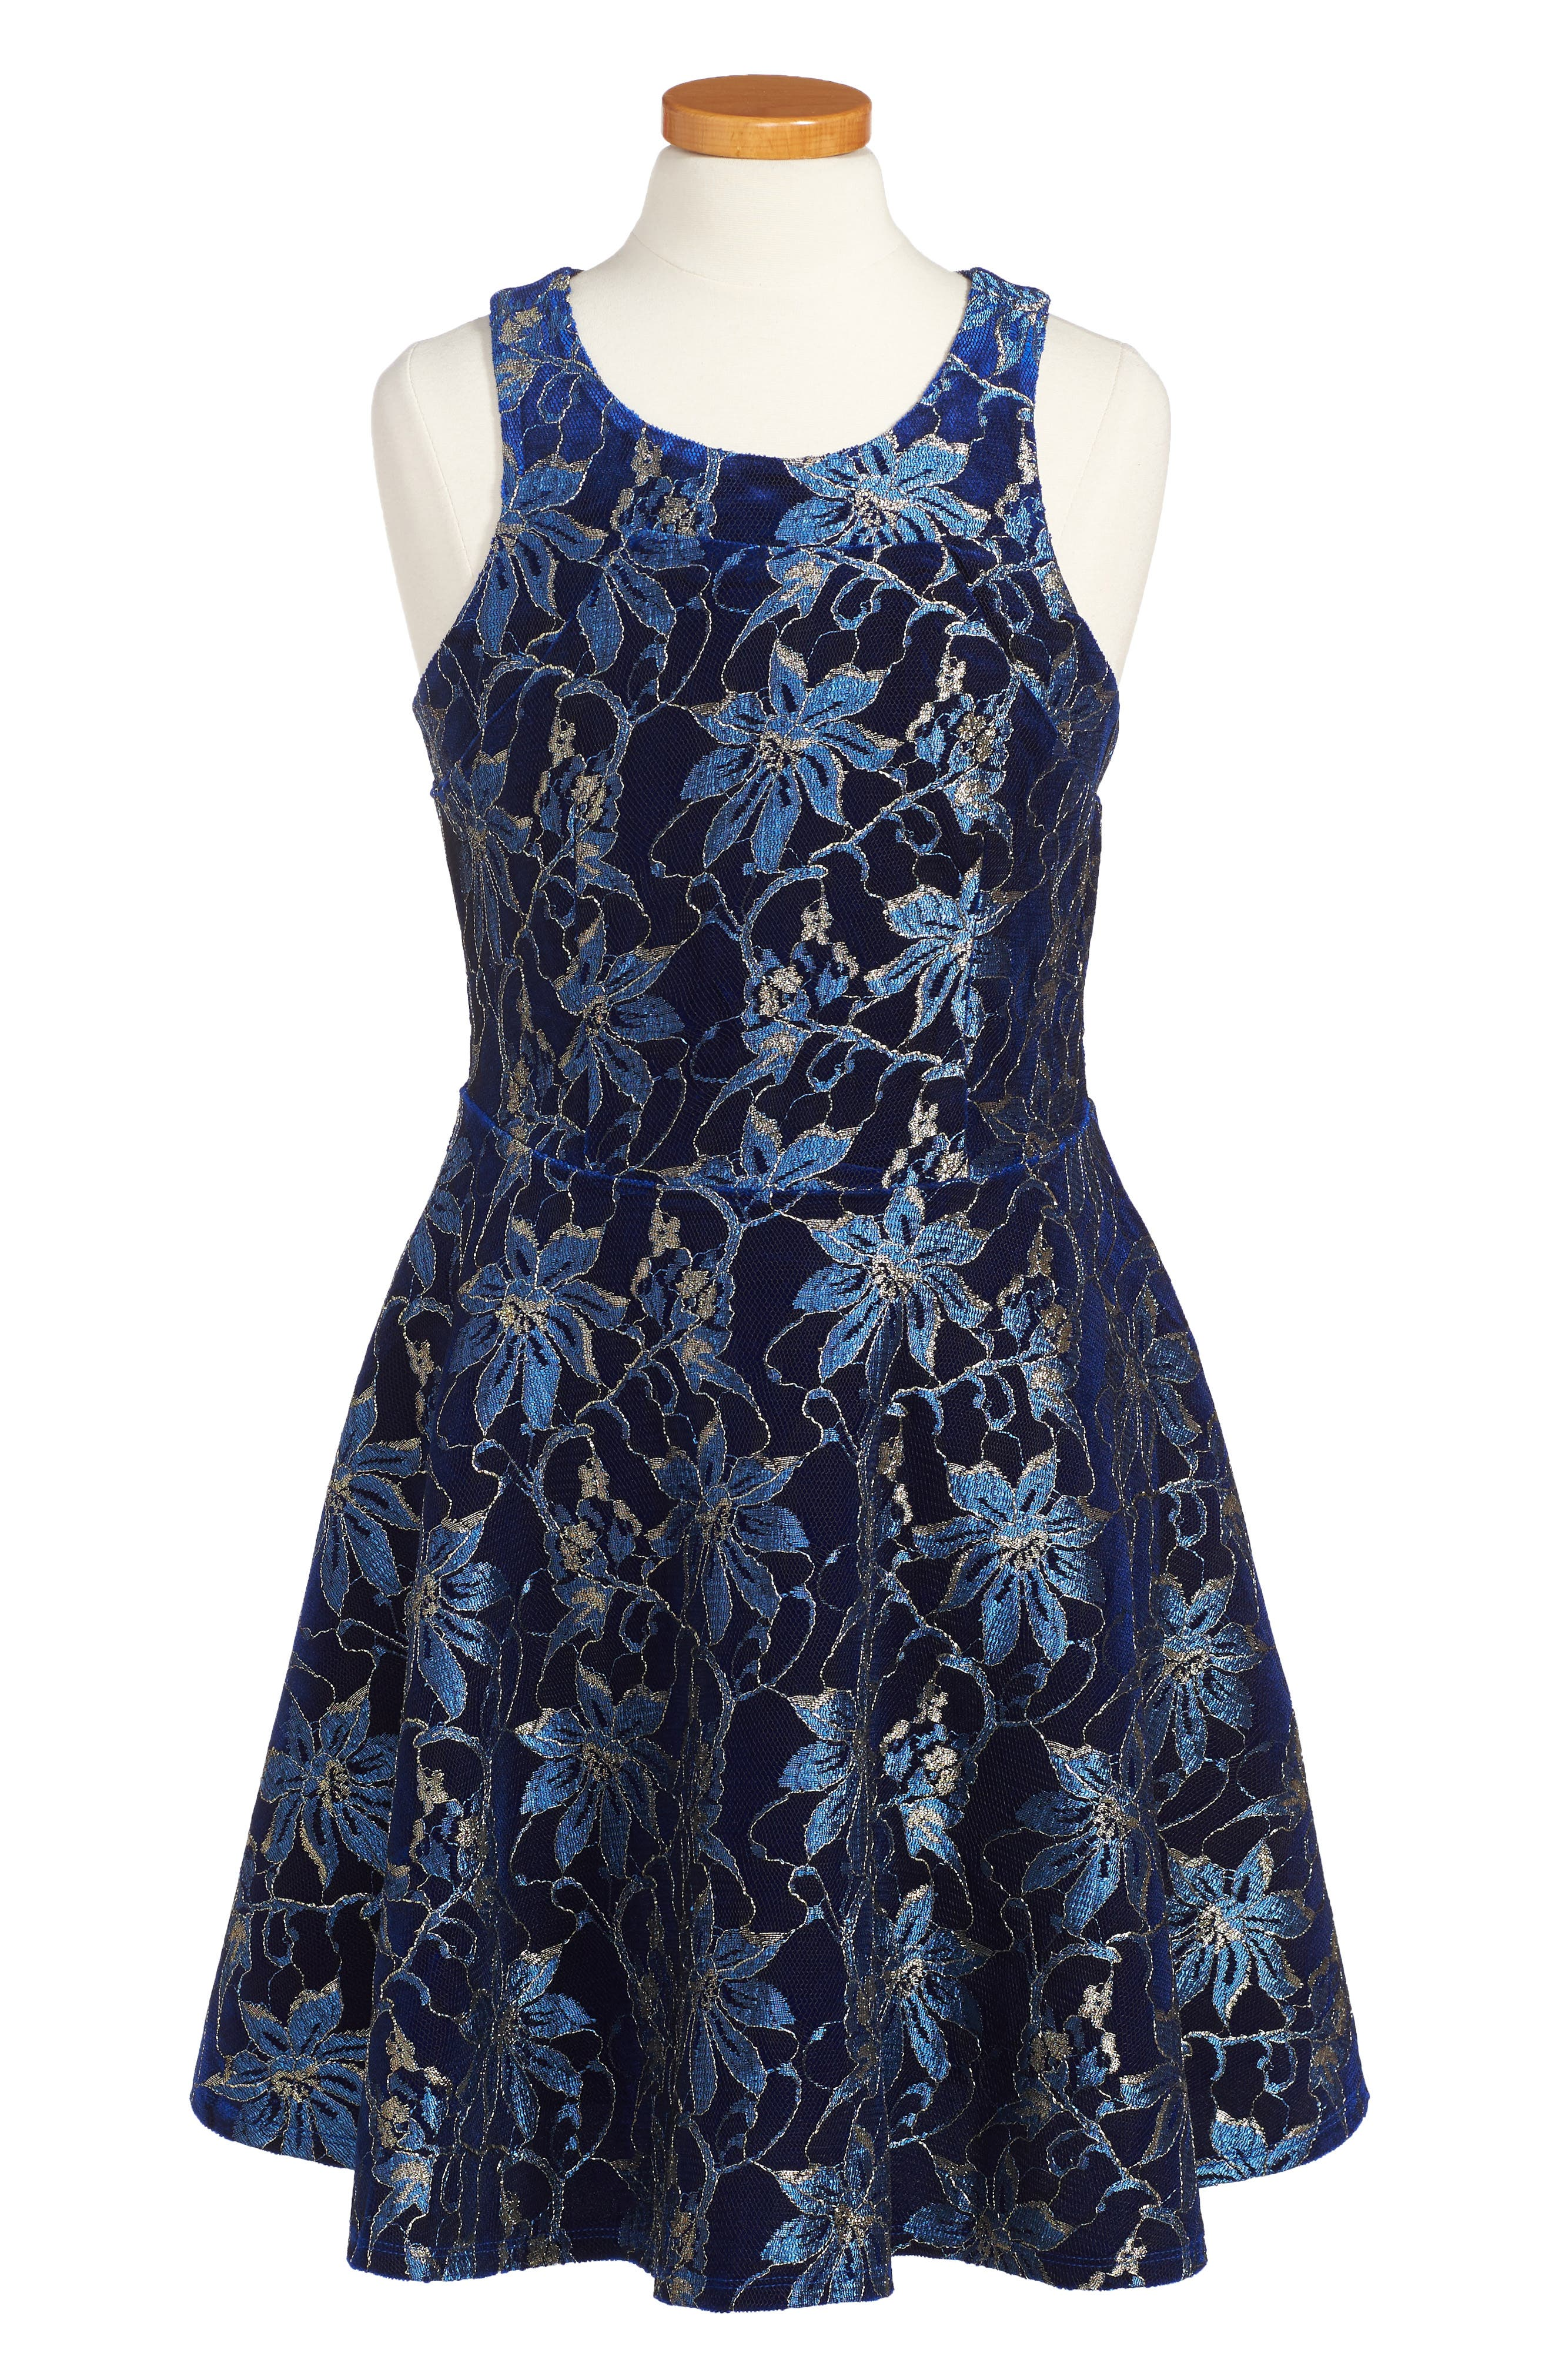 Heather Floral Mesh Dress,                         Main,                         color, Royal Blue